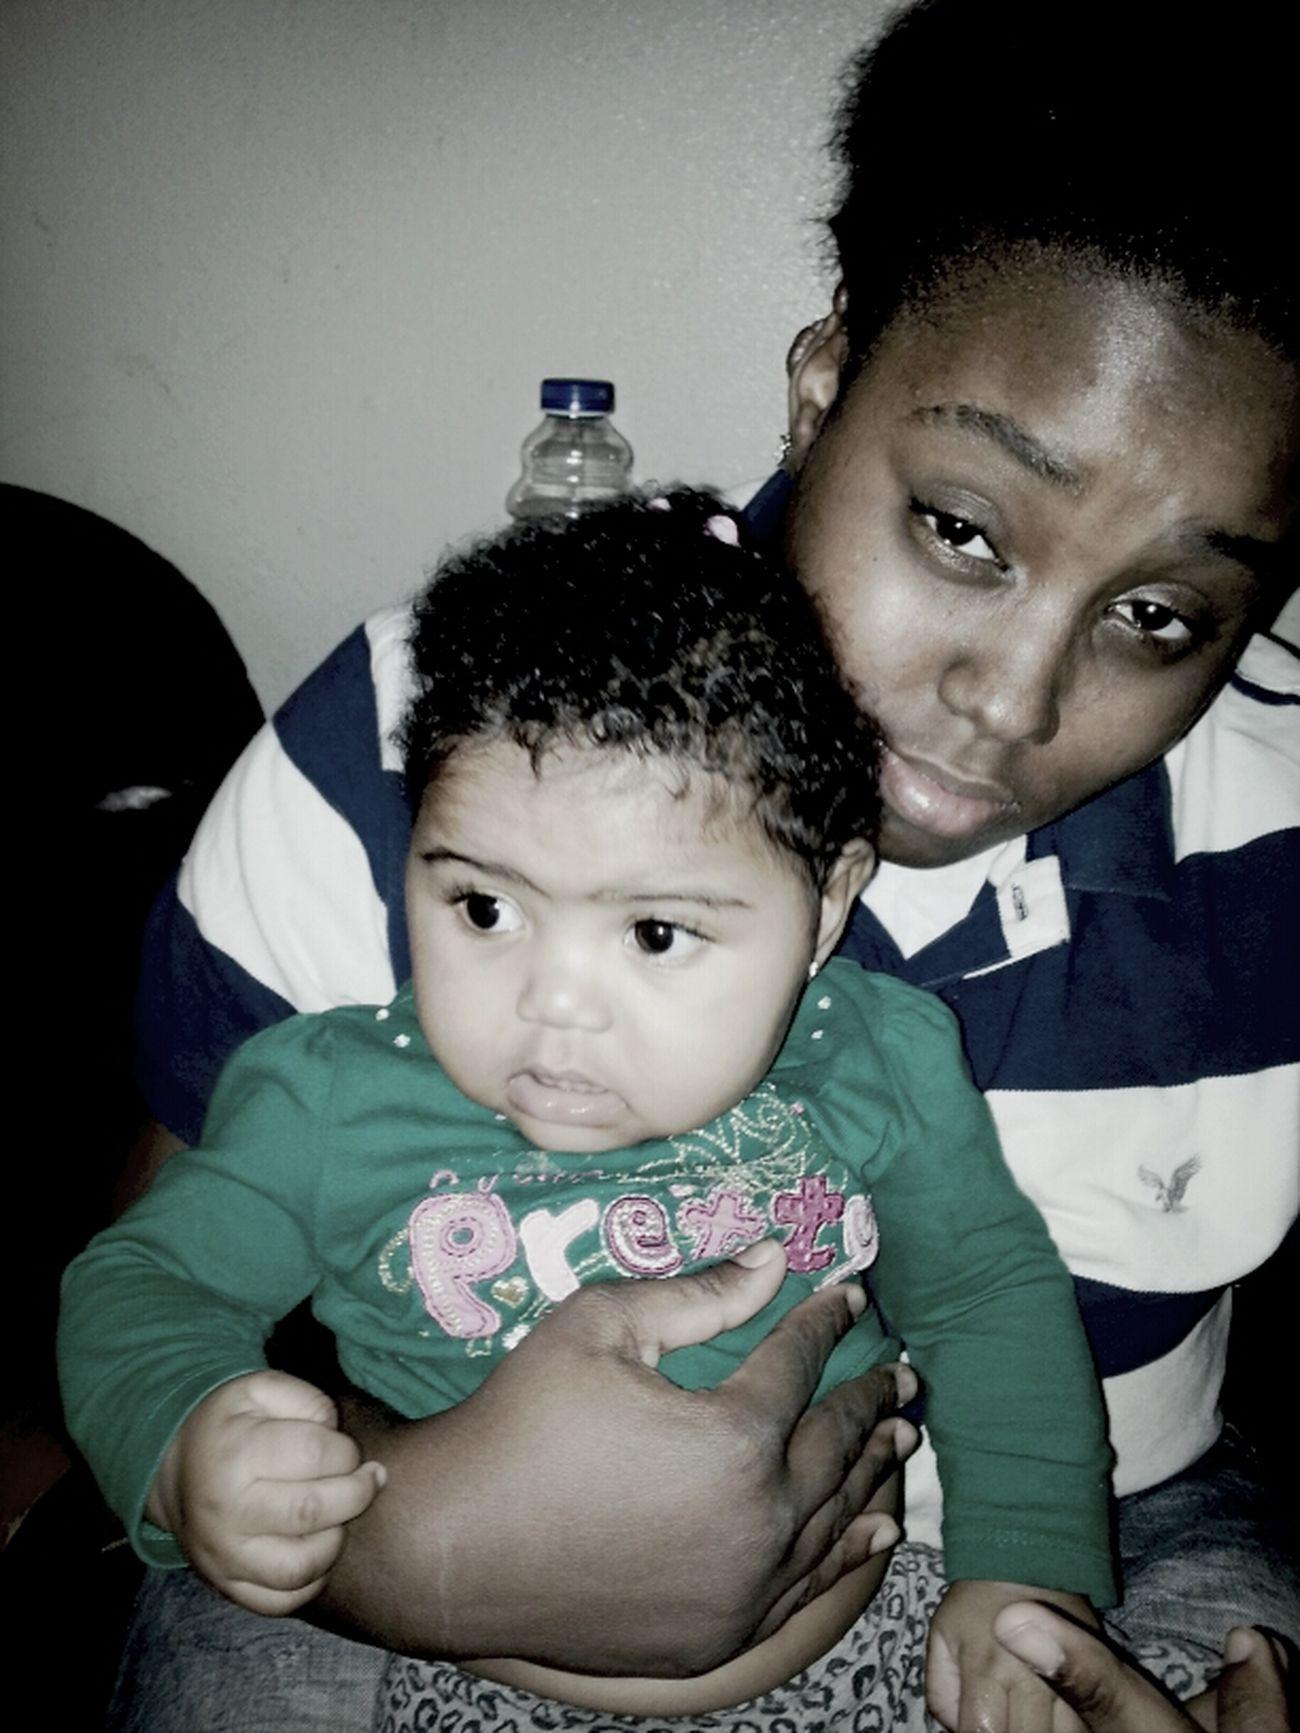 Me And My Qod Bby...